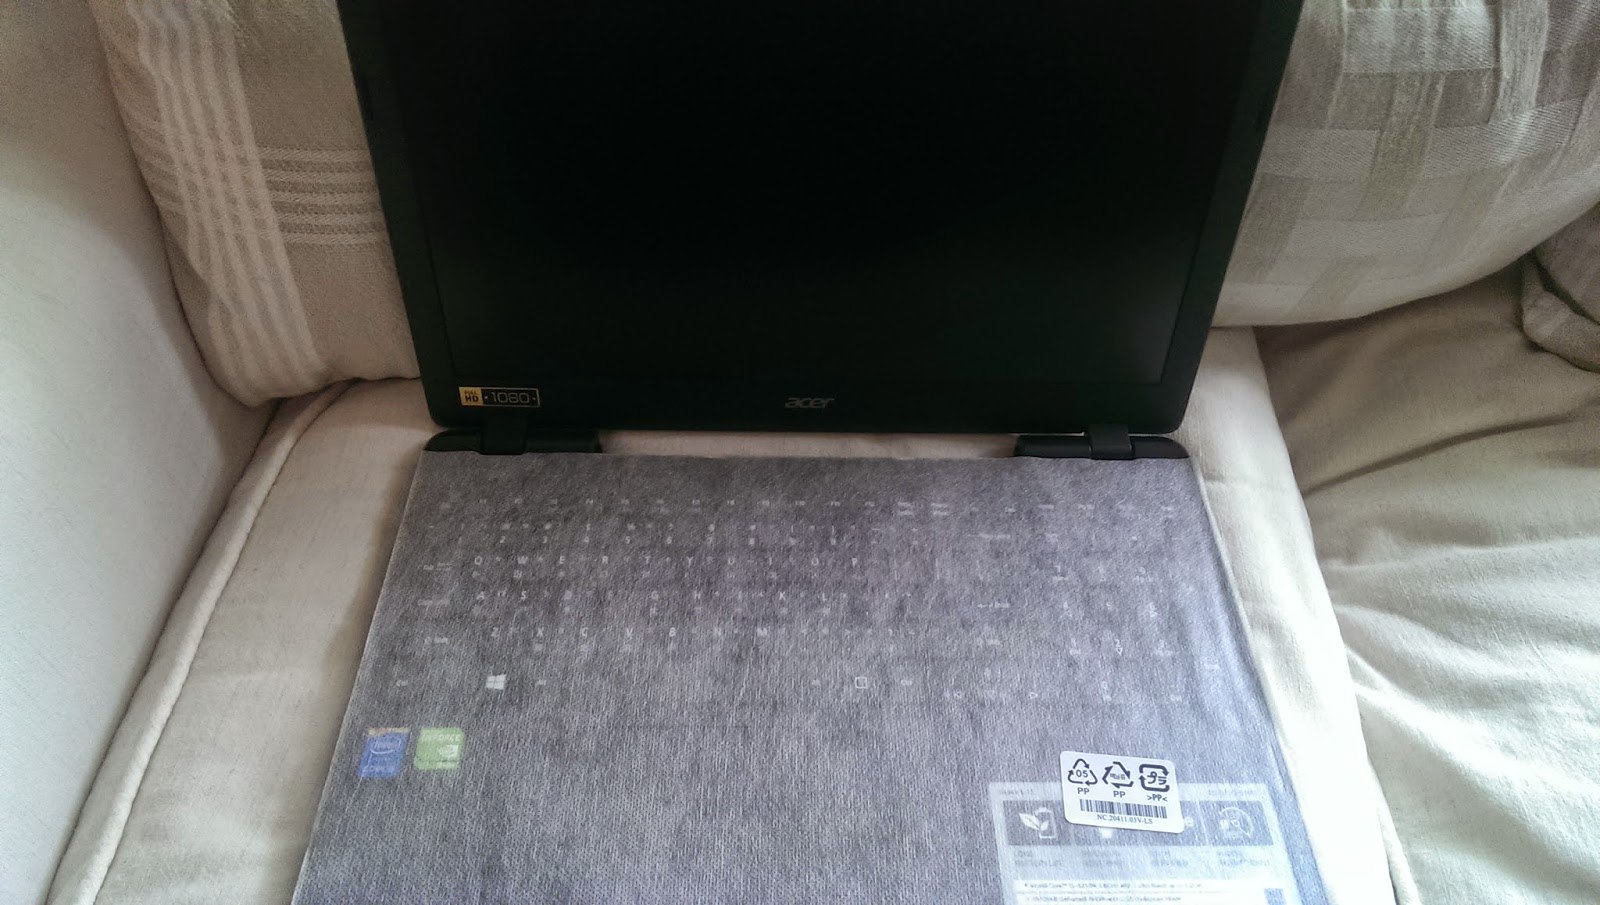 2015 03 22%2B12.13.18 - [開箱] Acer E5-572G i5-4210M 搭配NVIDIA 840G 2G獨顯